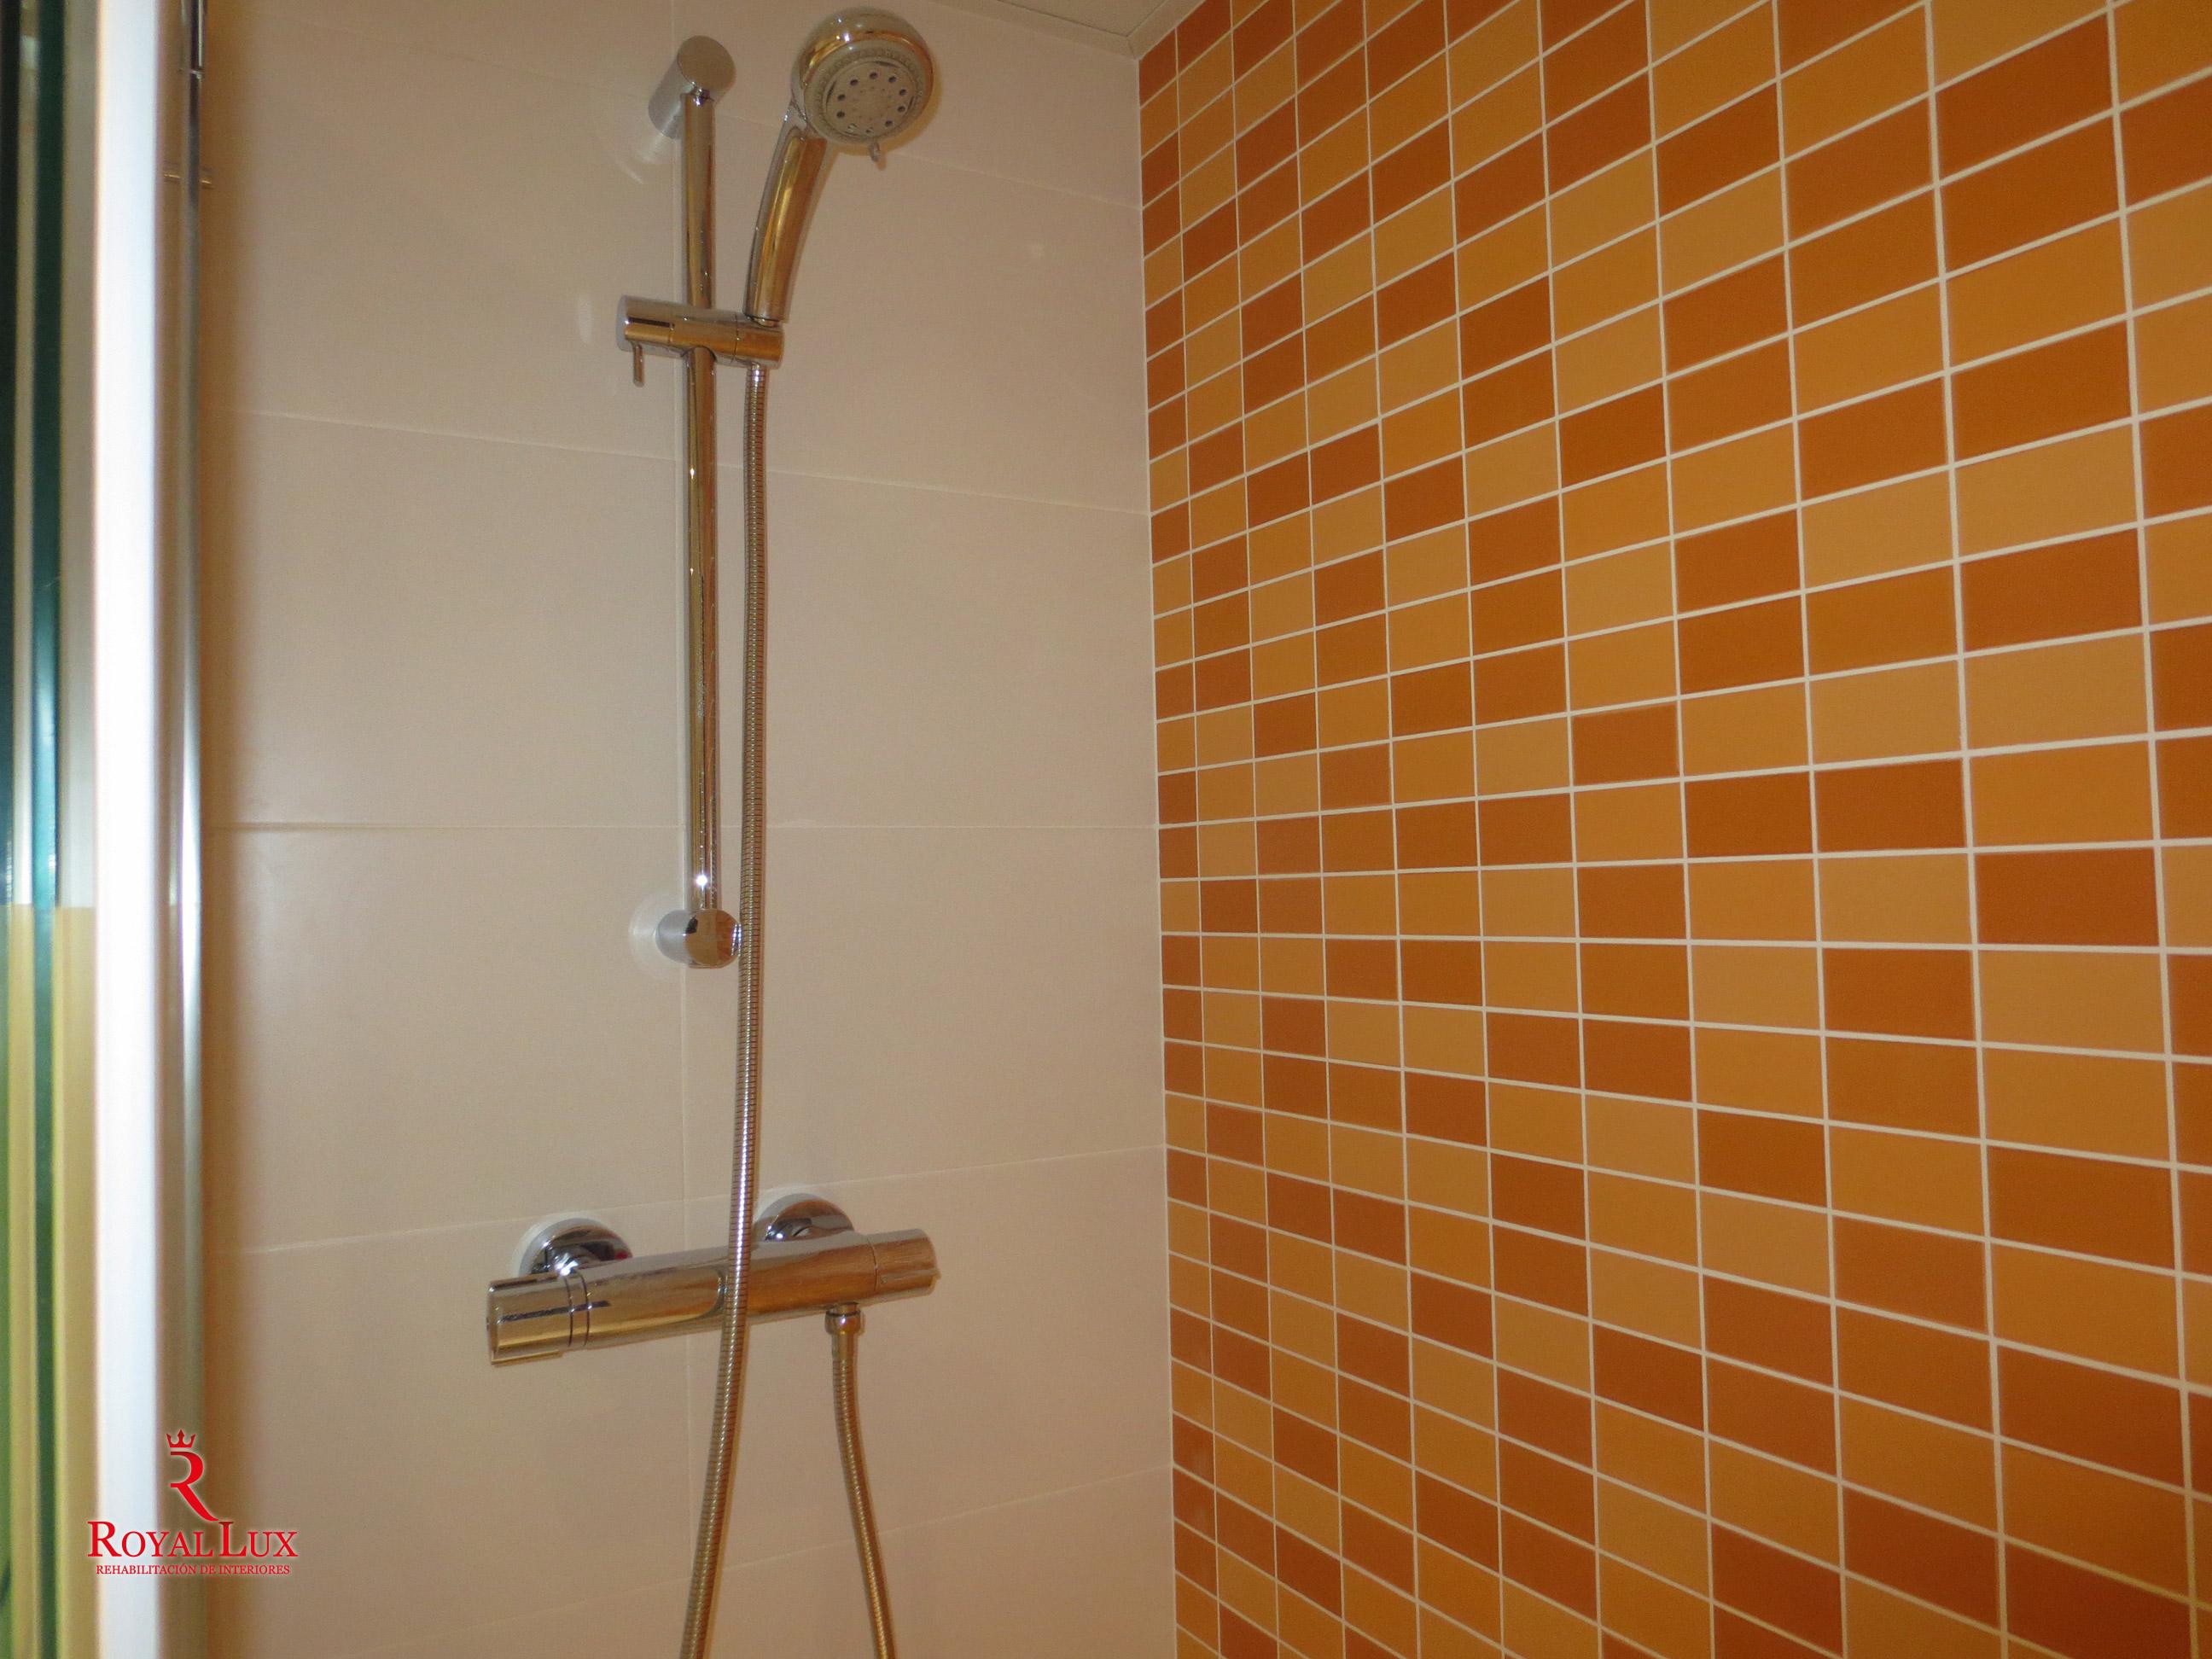 Proyectos de Rehabilitación de Interiores - Royal Lux